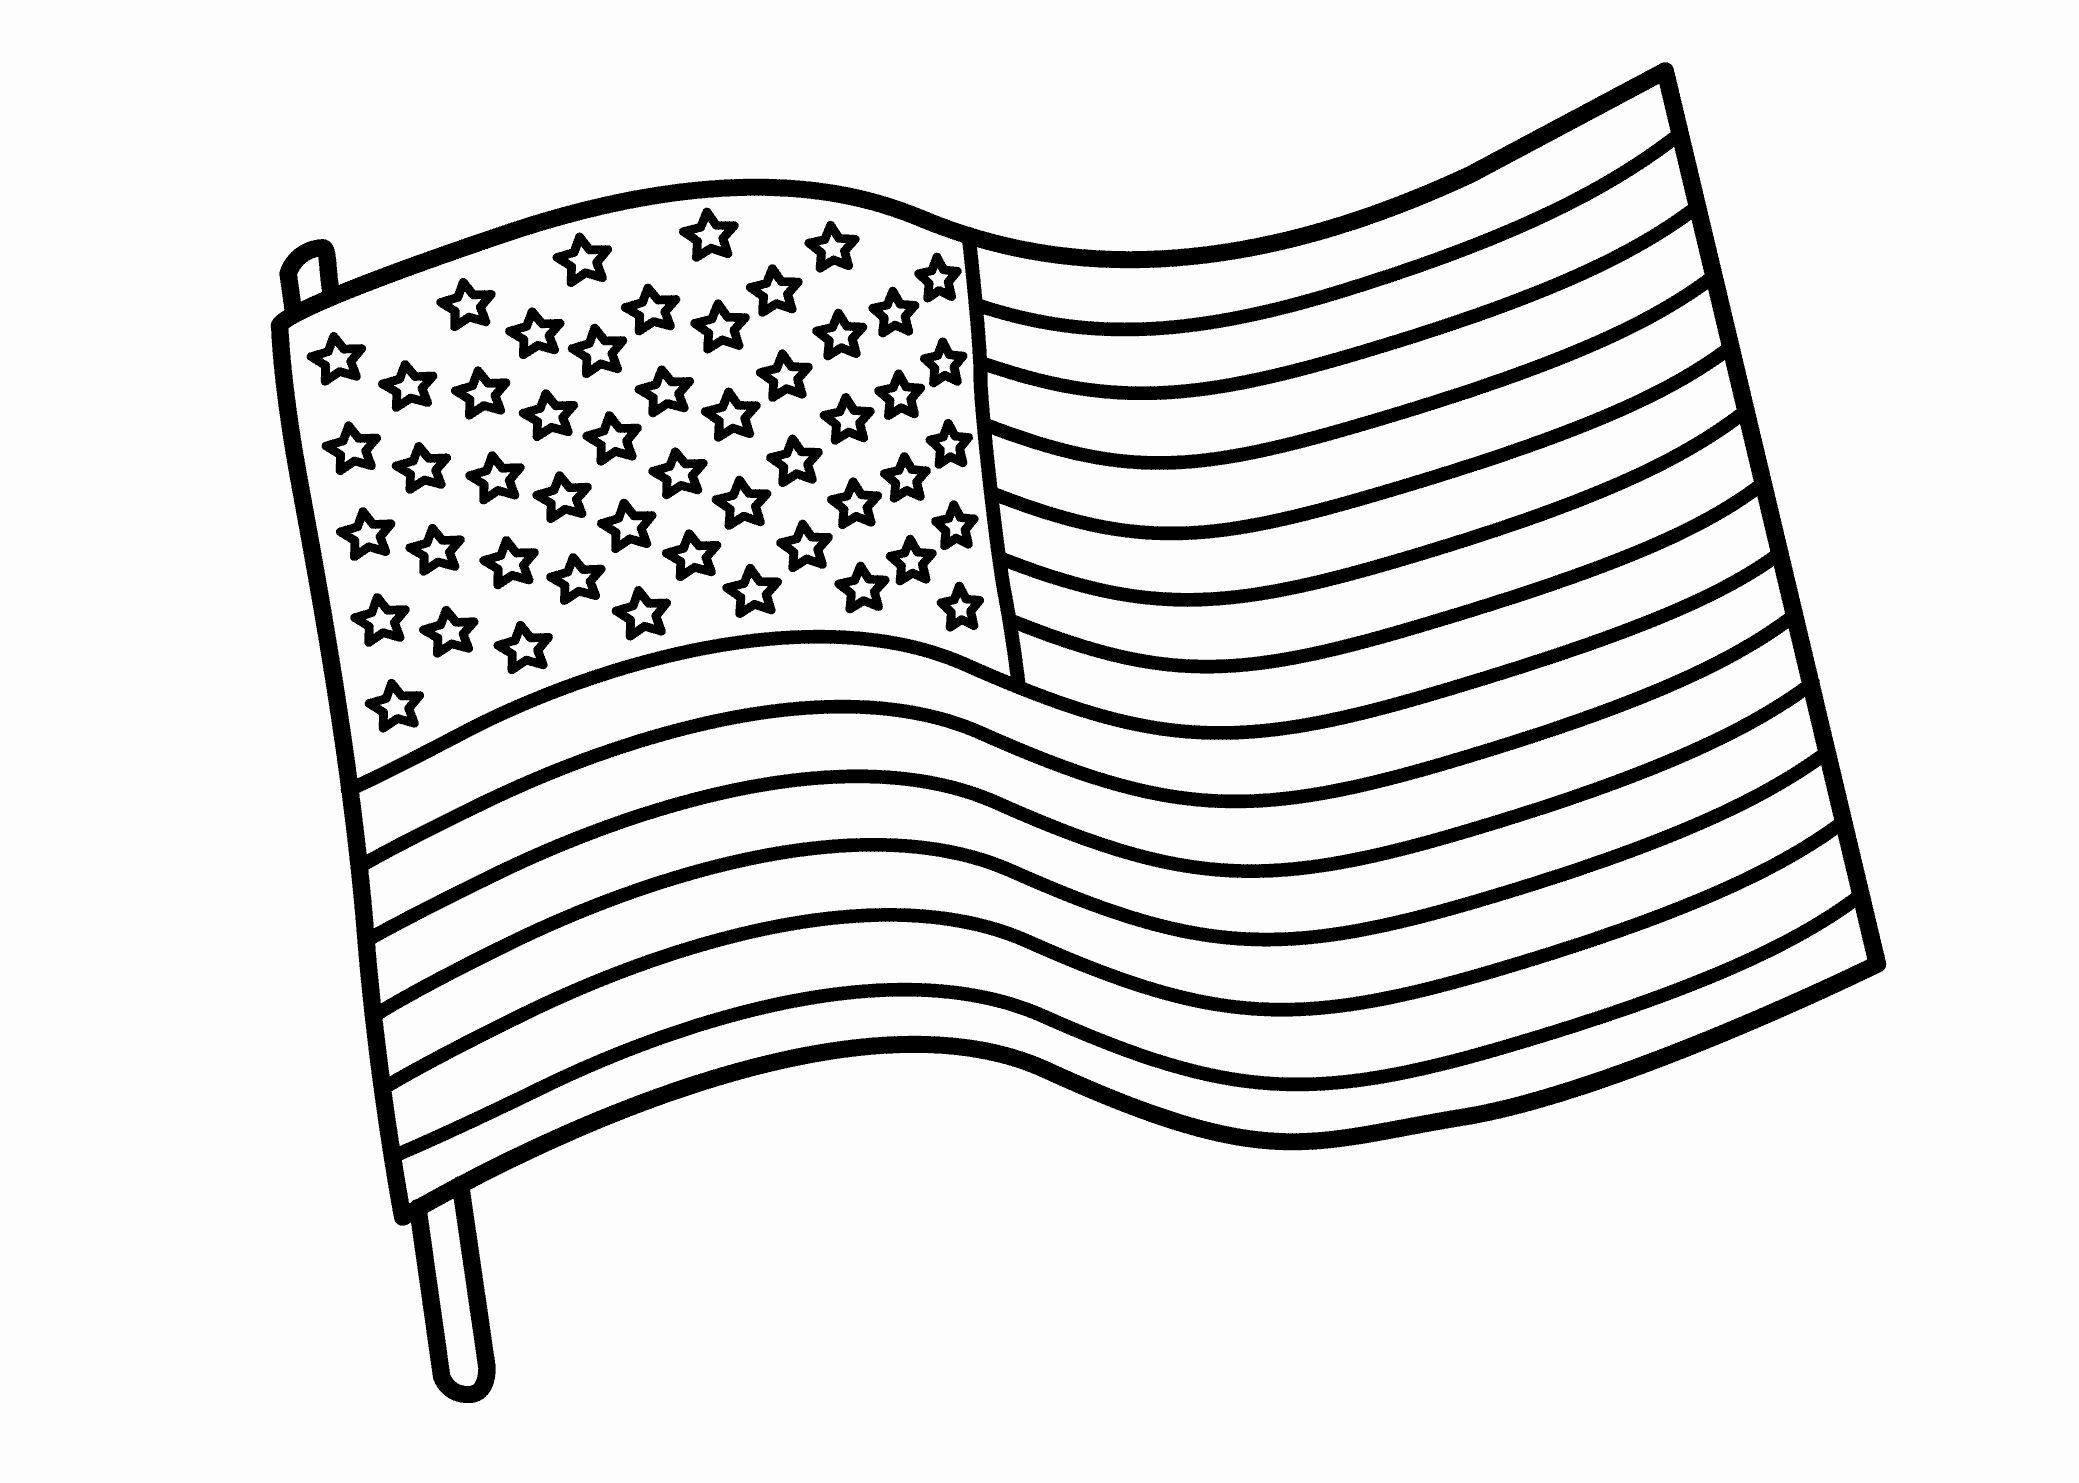 United States Flag Coloring Page Elegant American Flag Coloring Pages Best Coloring Pages American Flag Coloring Page Flag Coloring Pages American Flag Colors